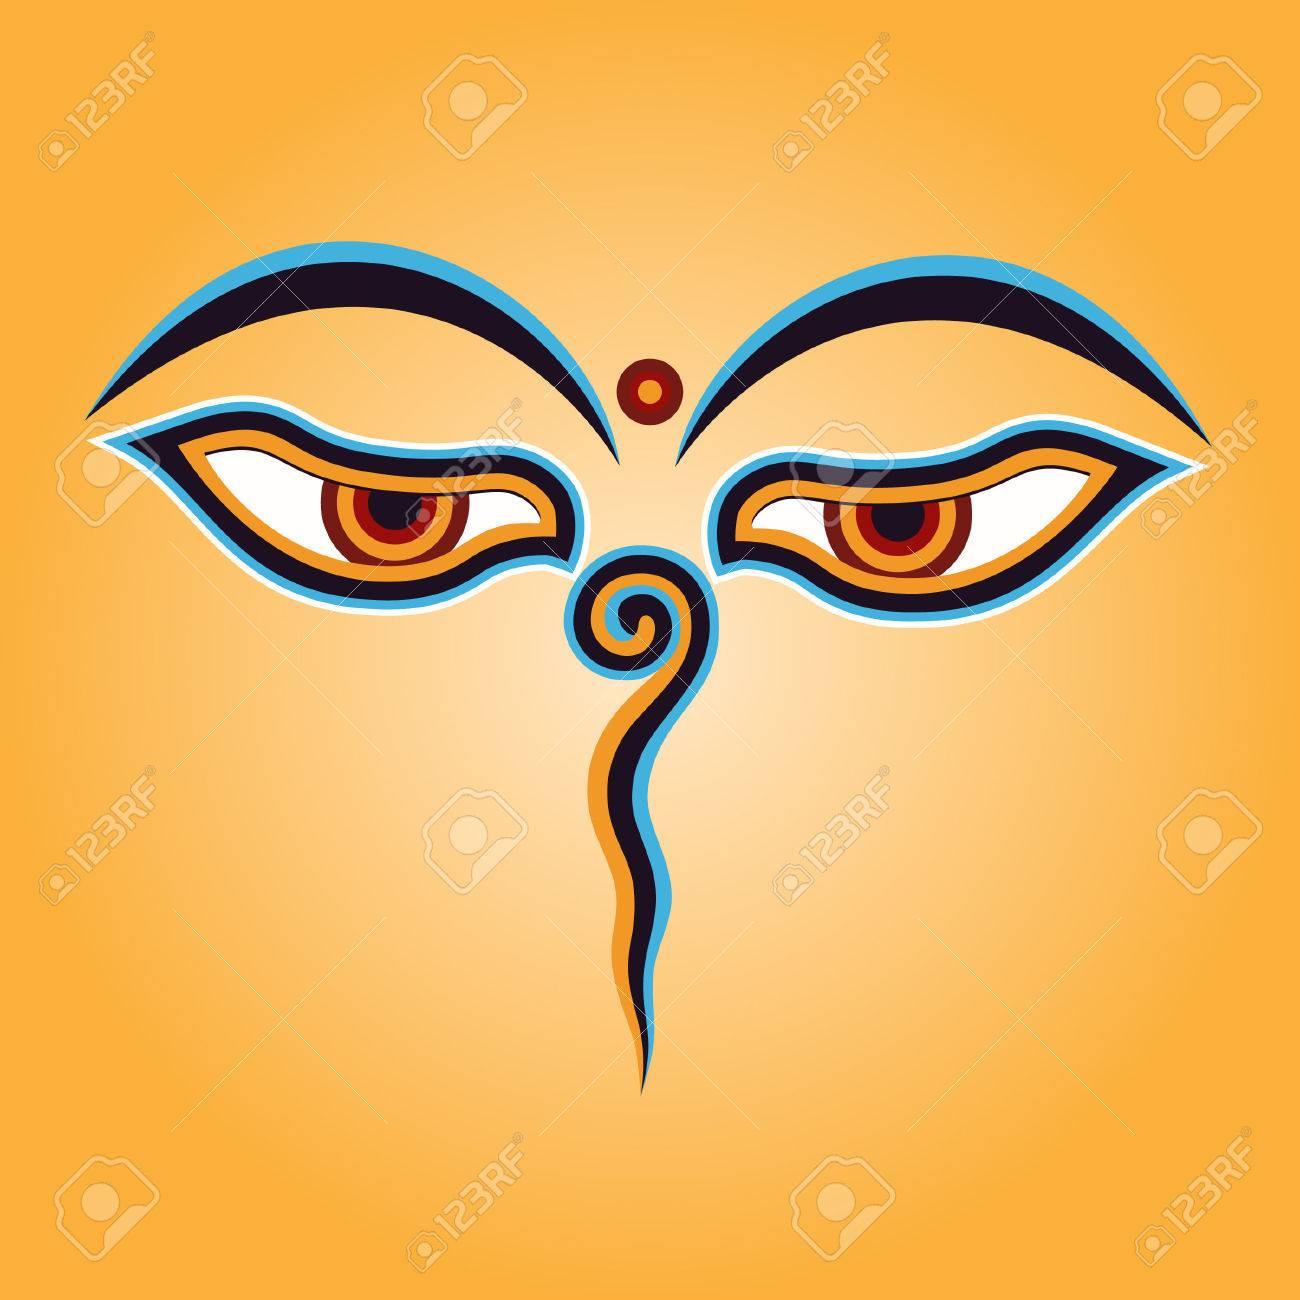 Buddha eyes vector royalty free cliparts vectors and stock buddha eyes vector stock vector 36999723 biocorpaavc Images